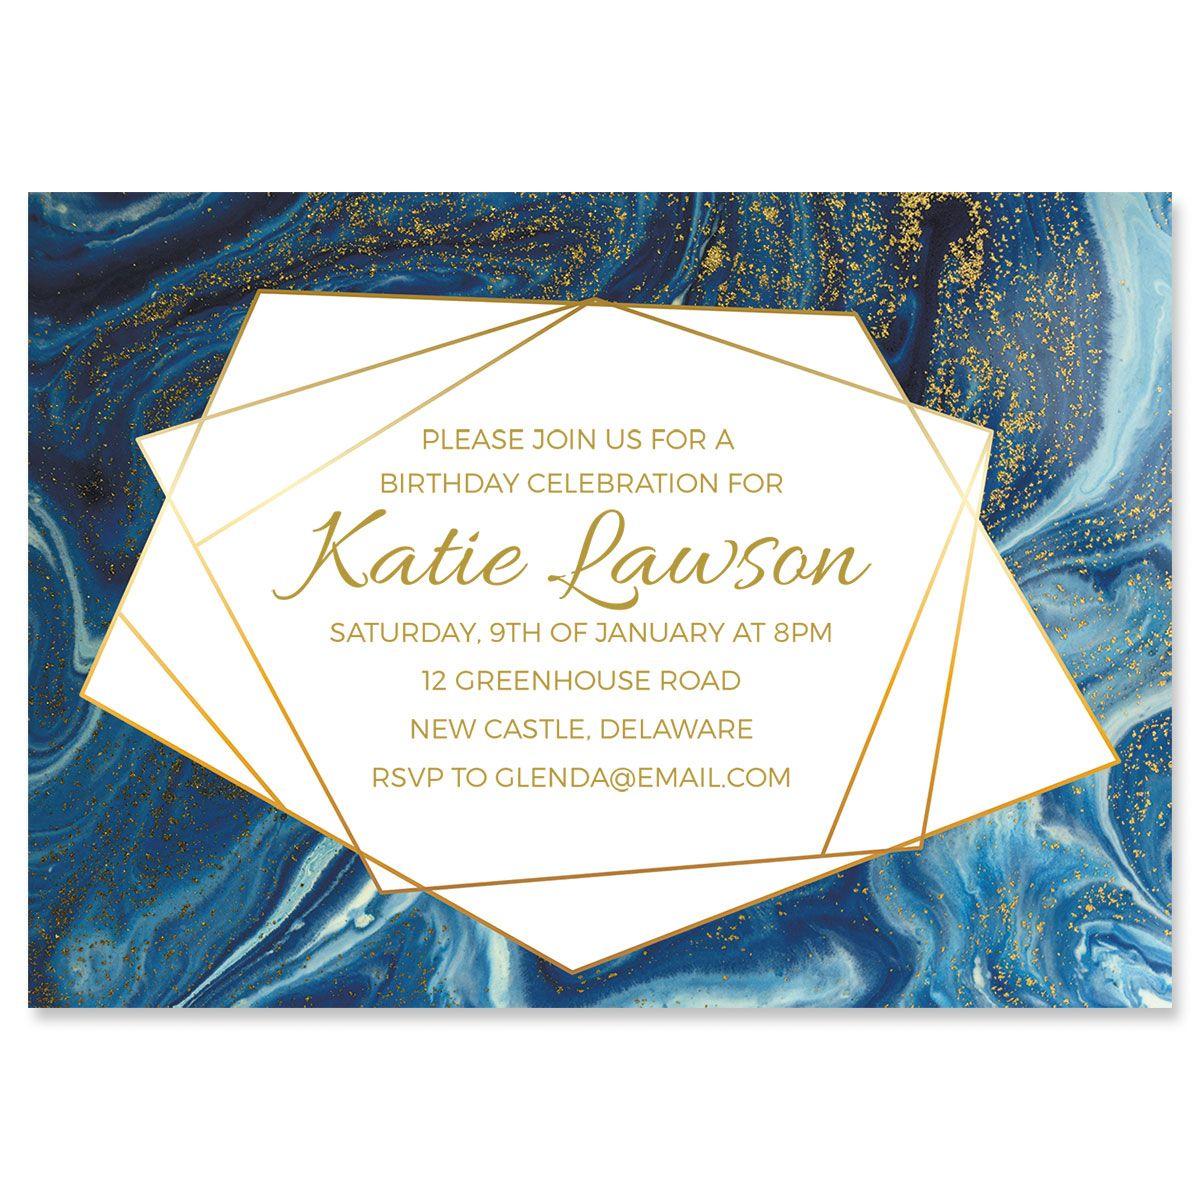 Modern Marble Indulgence Personalized Invitation